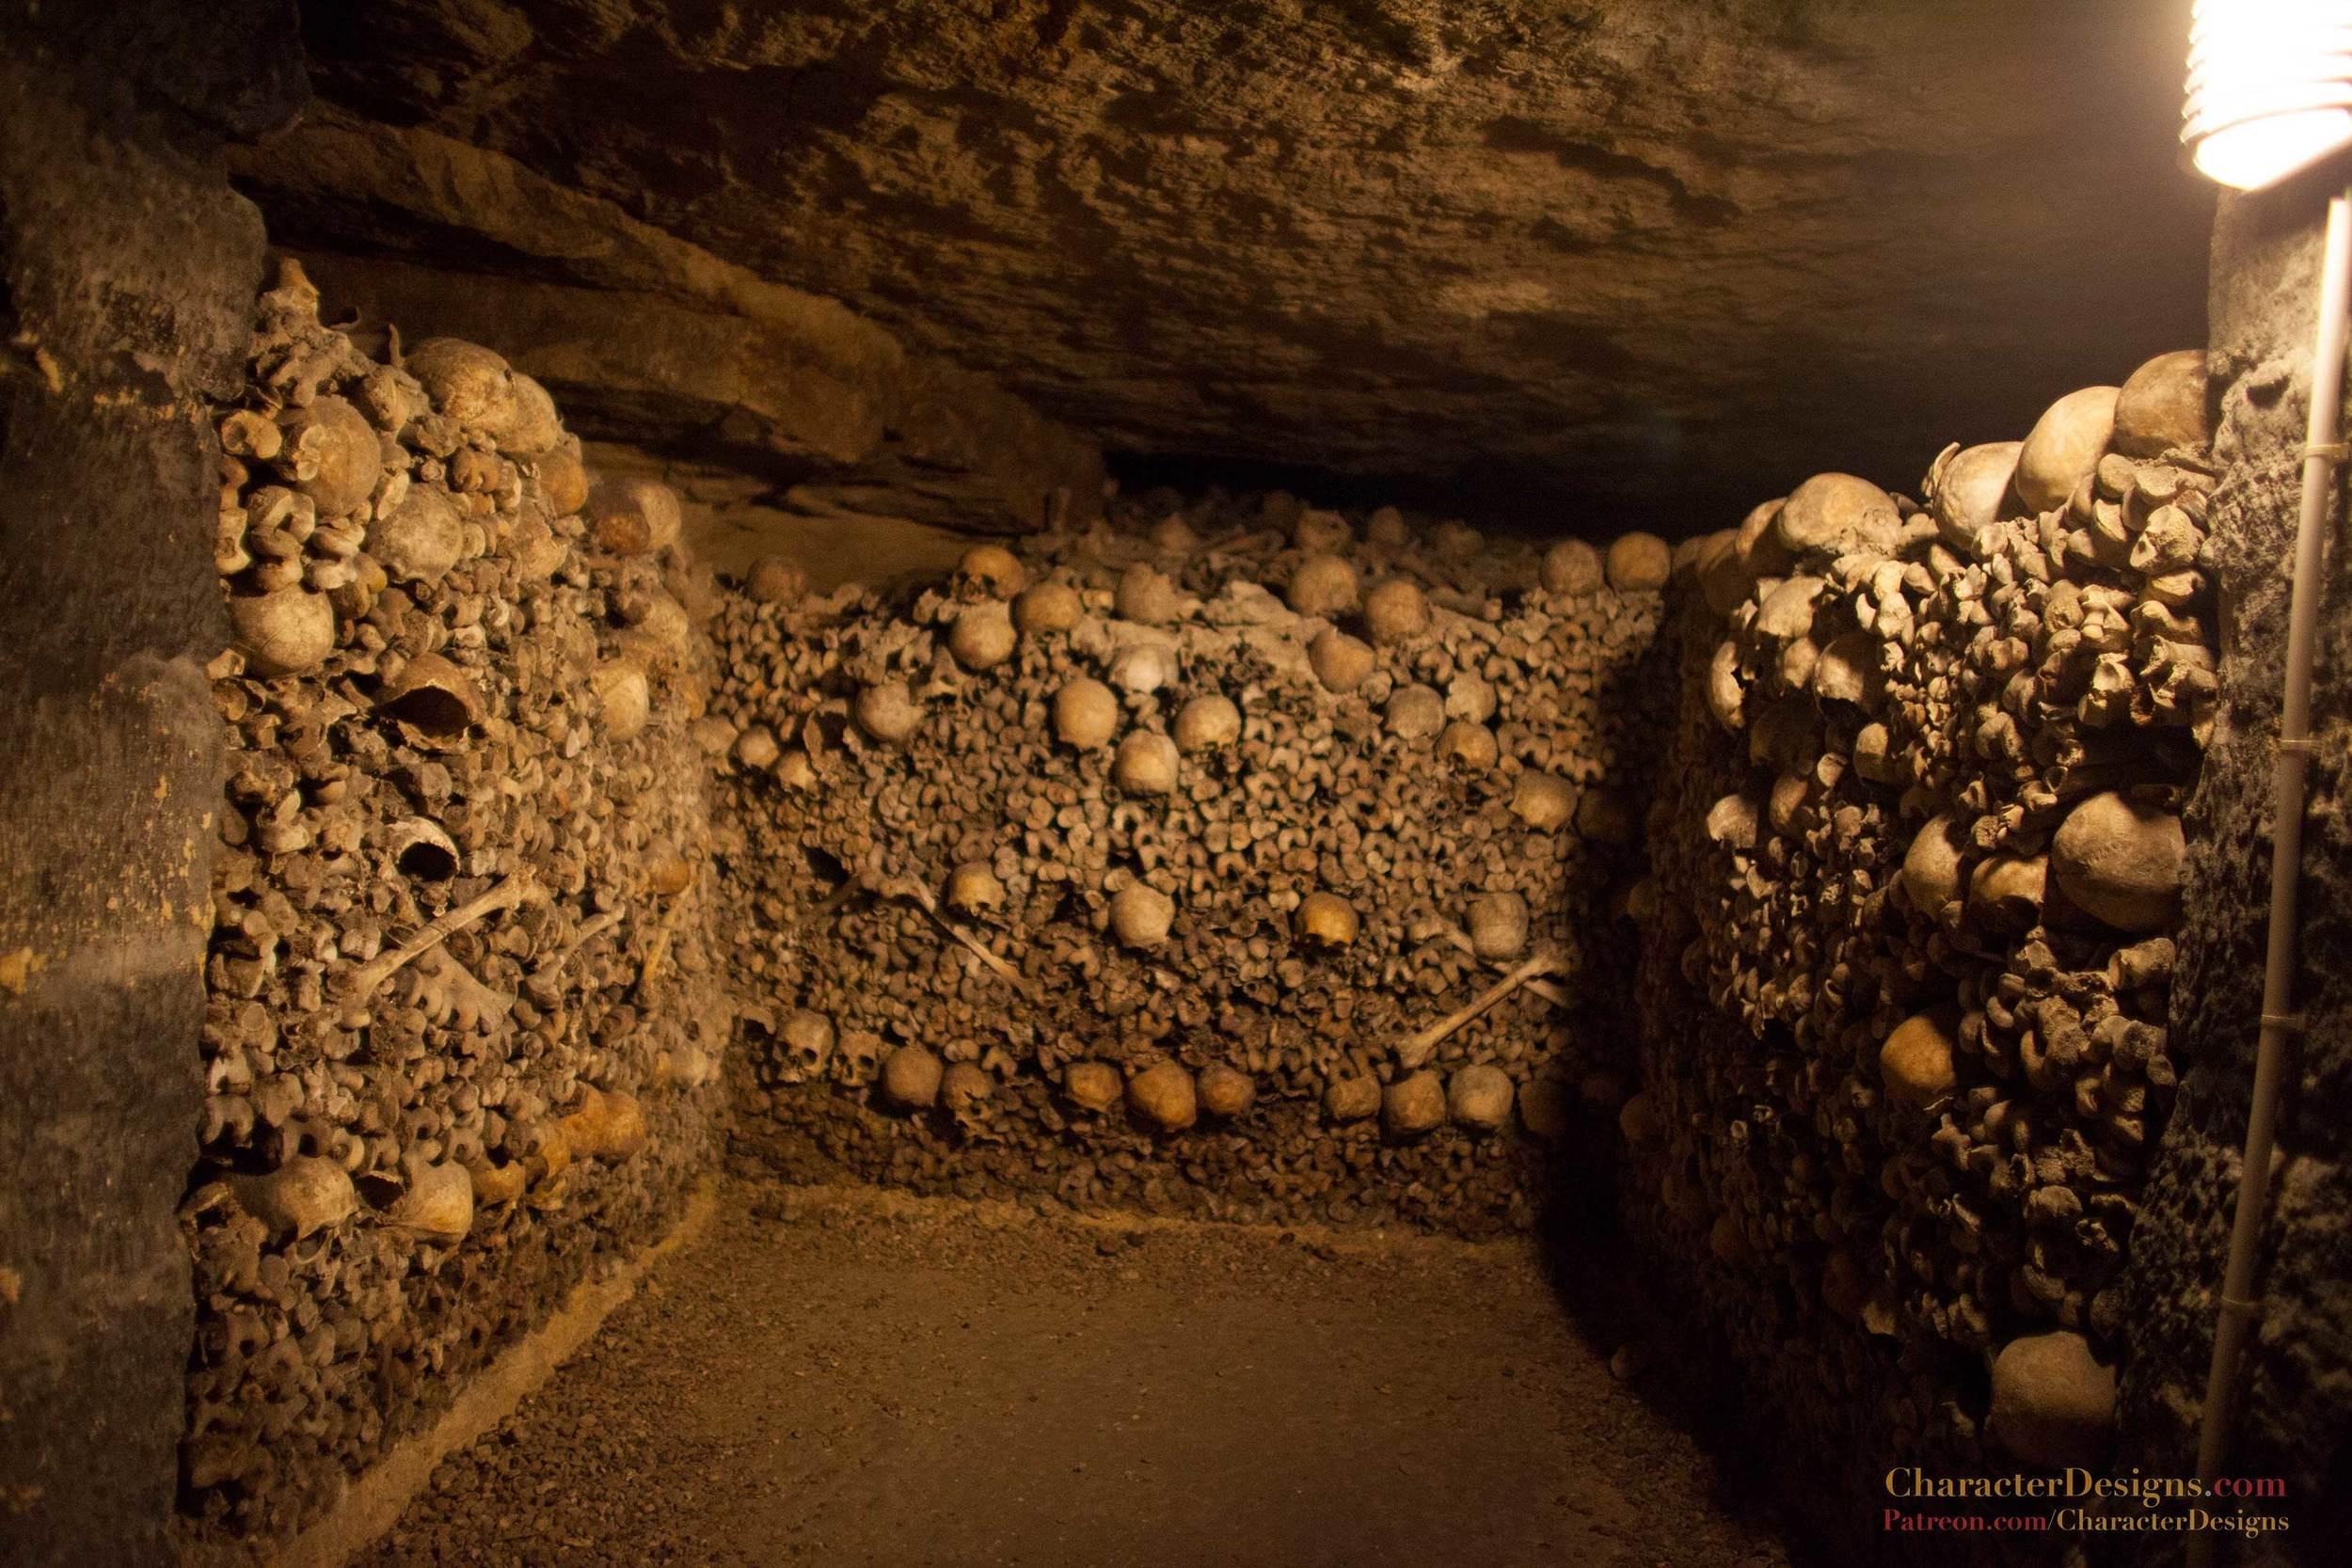 Catacombs_012.jpg